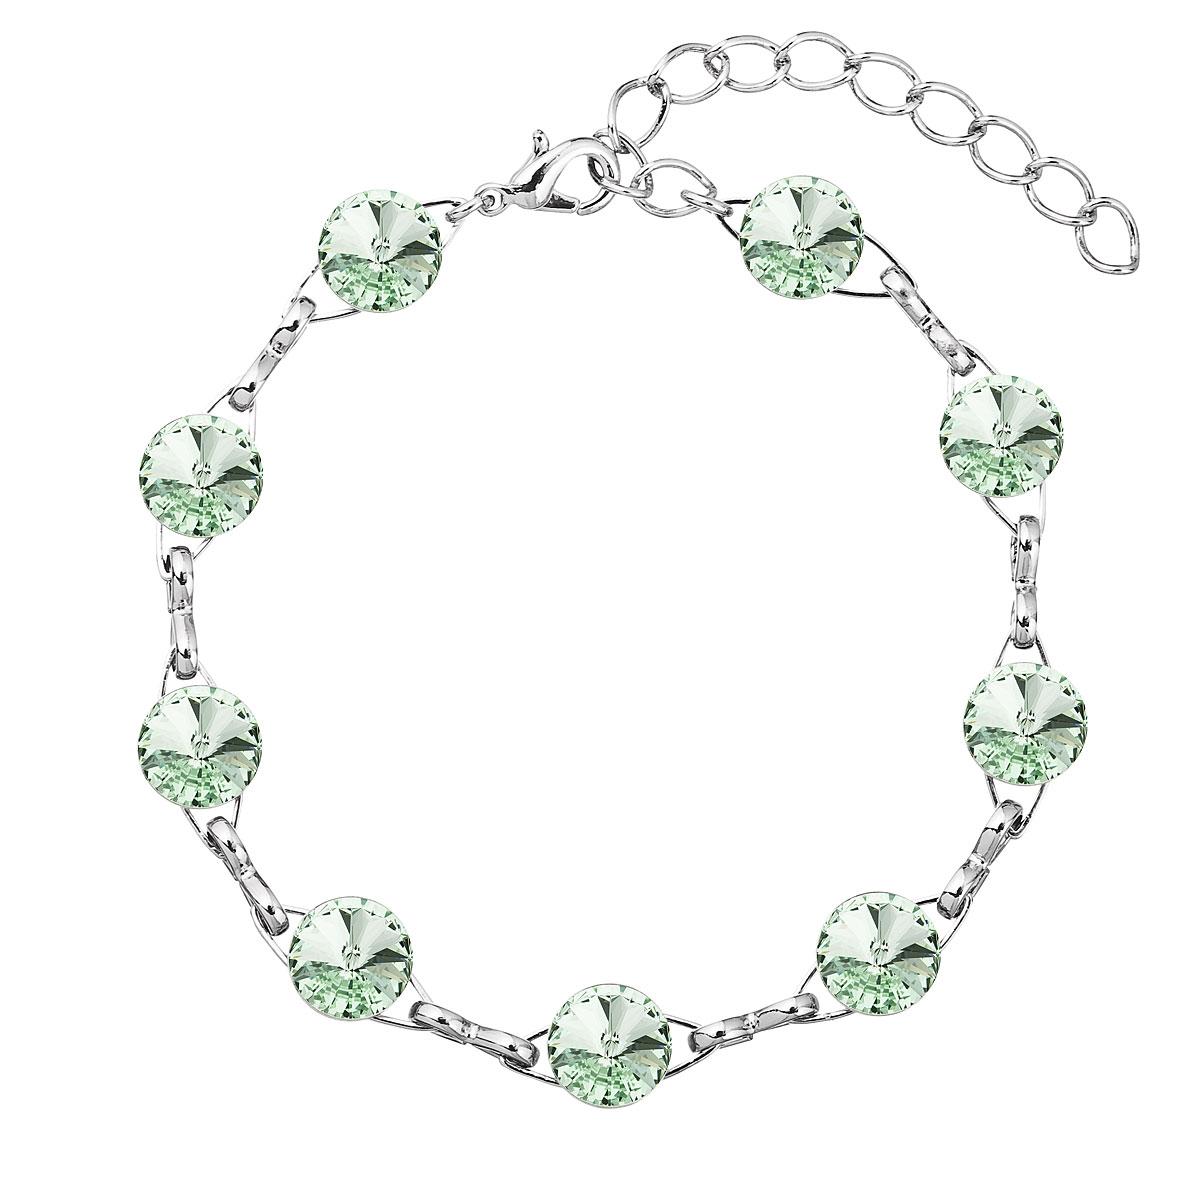 Náramek bižuterie se Swarovski krystaly zelený 53001.3